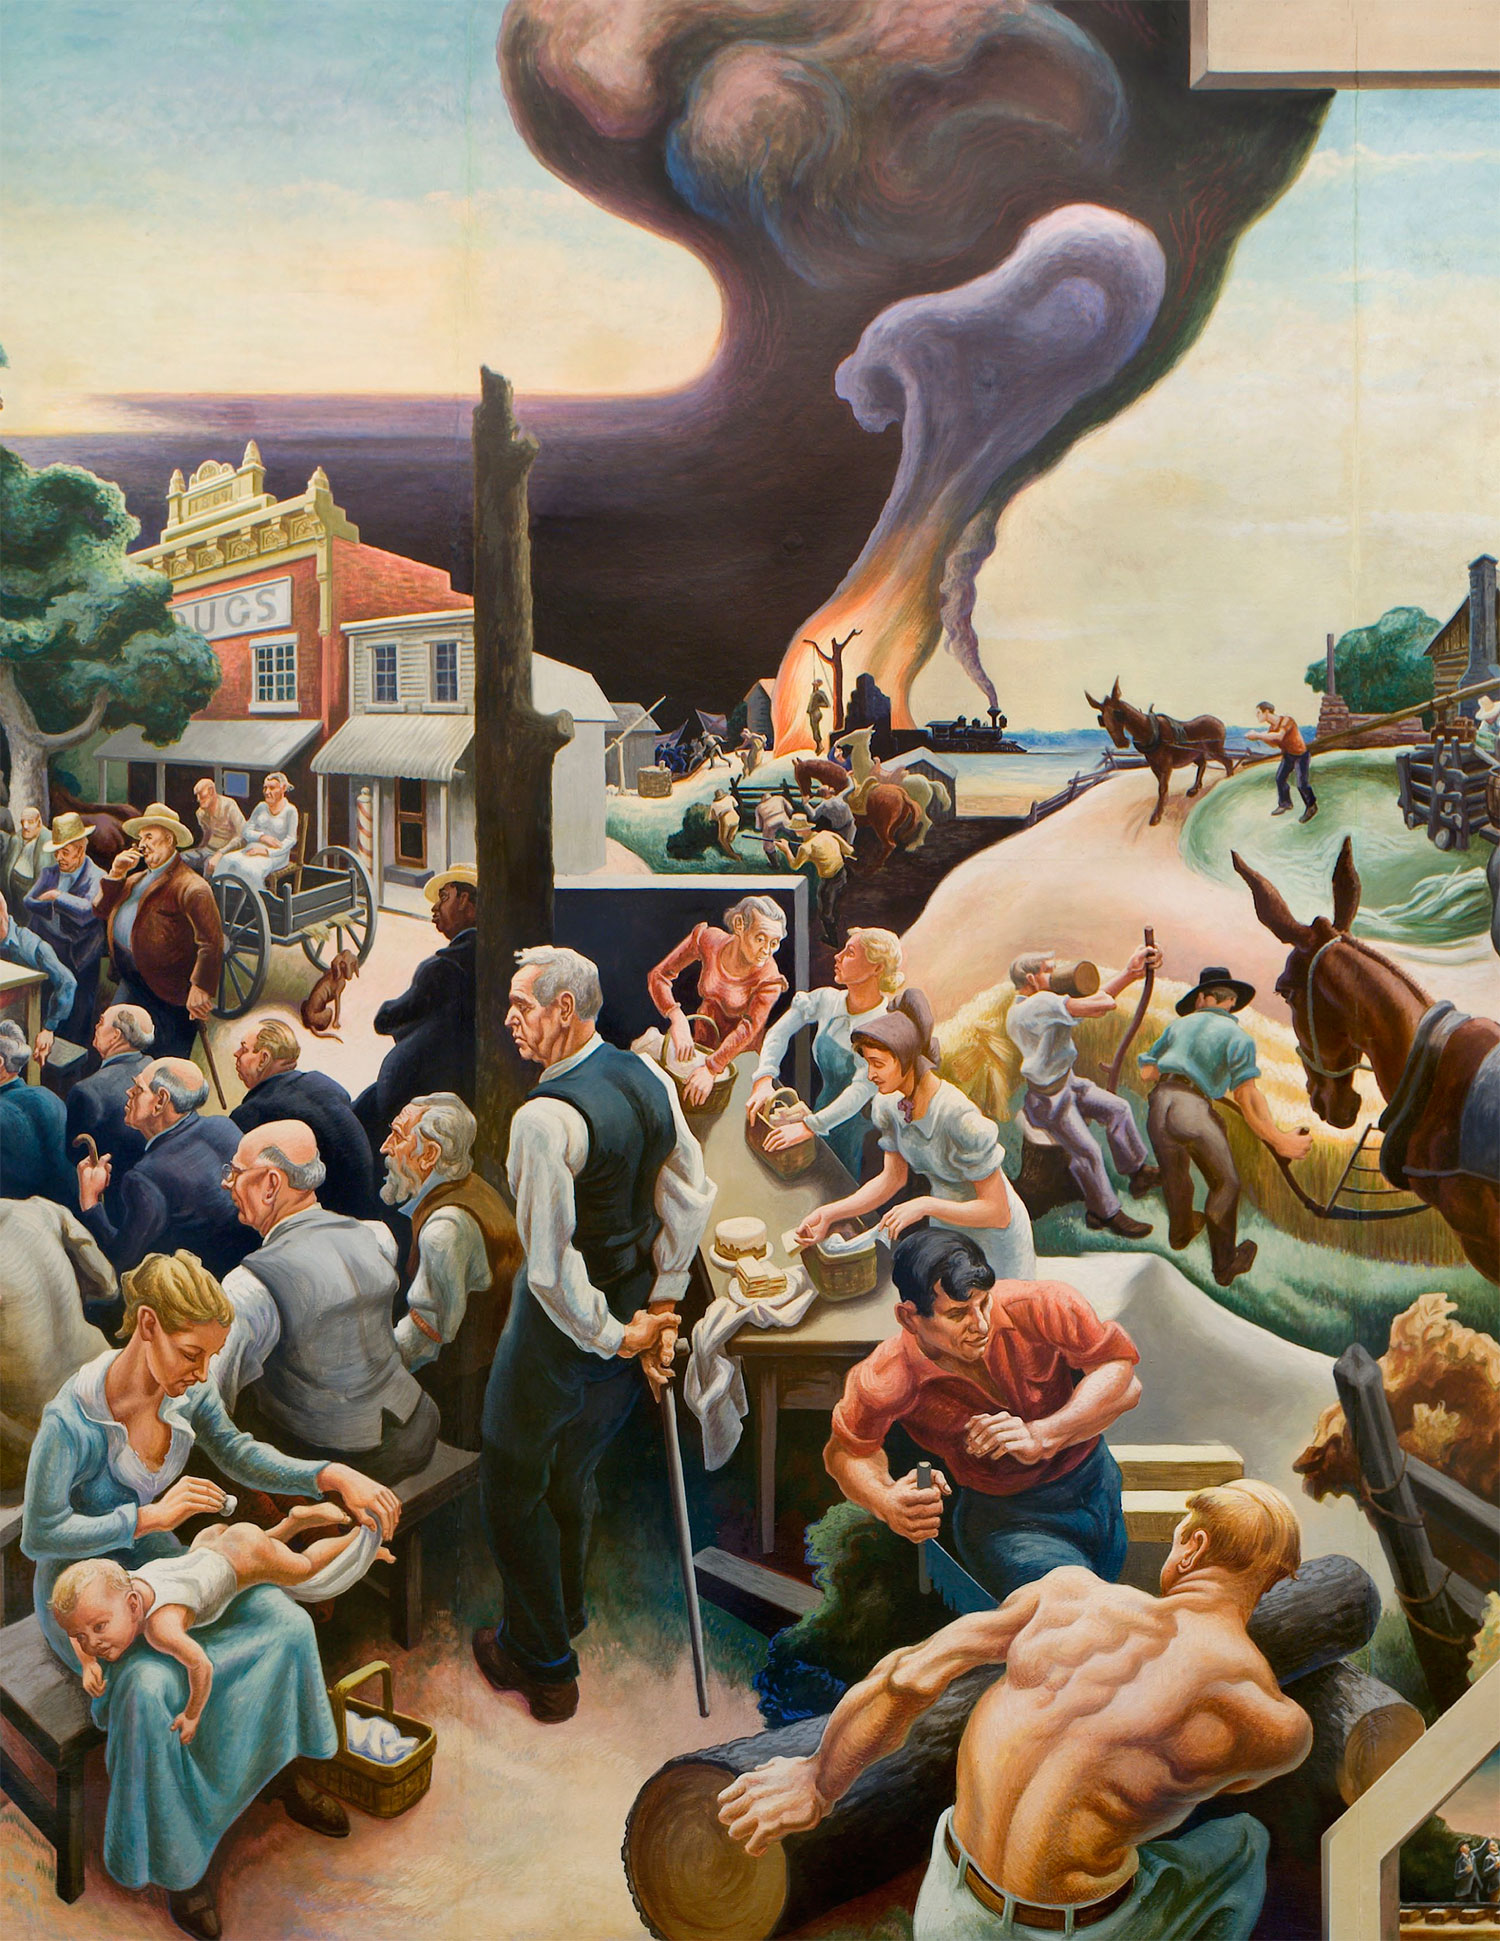 History of Benton